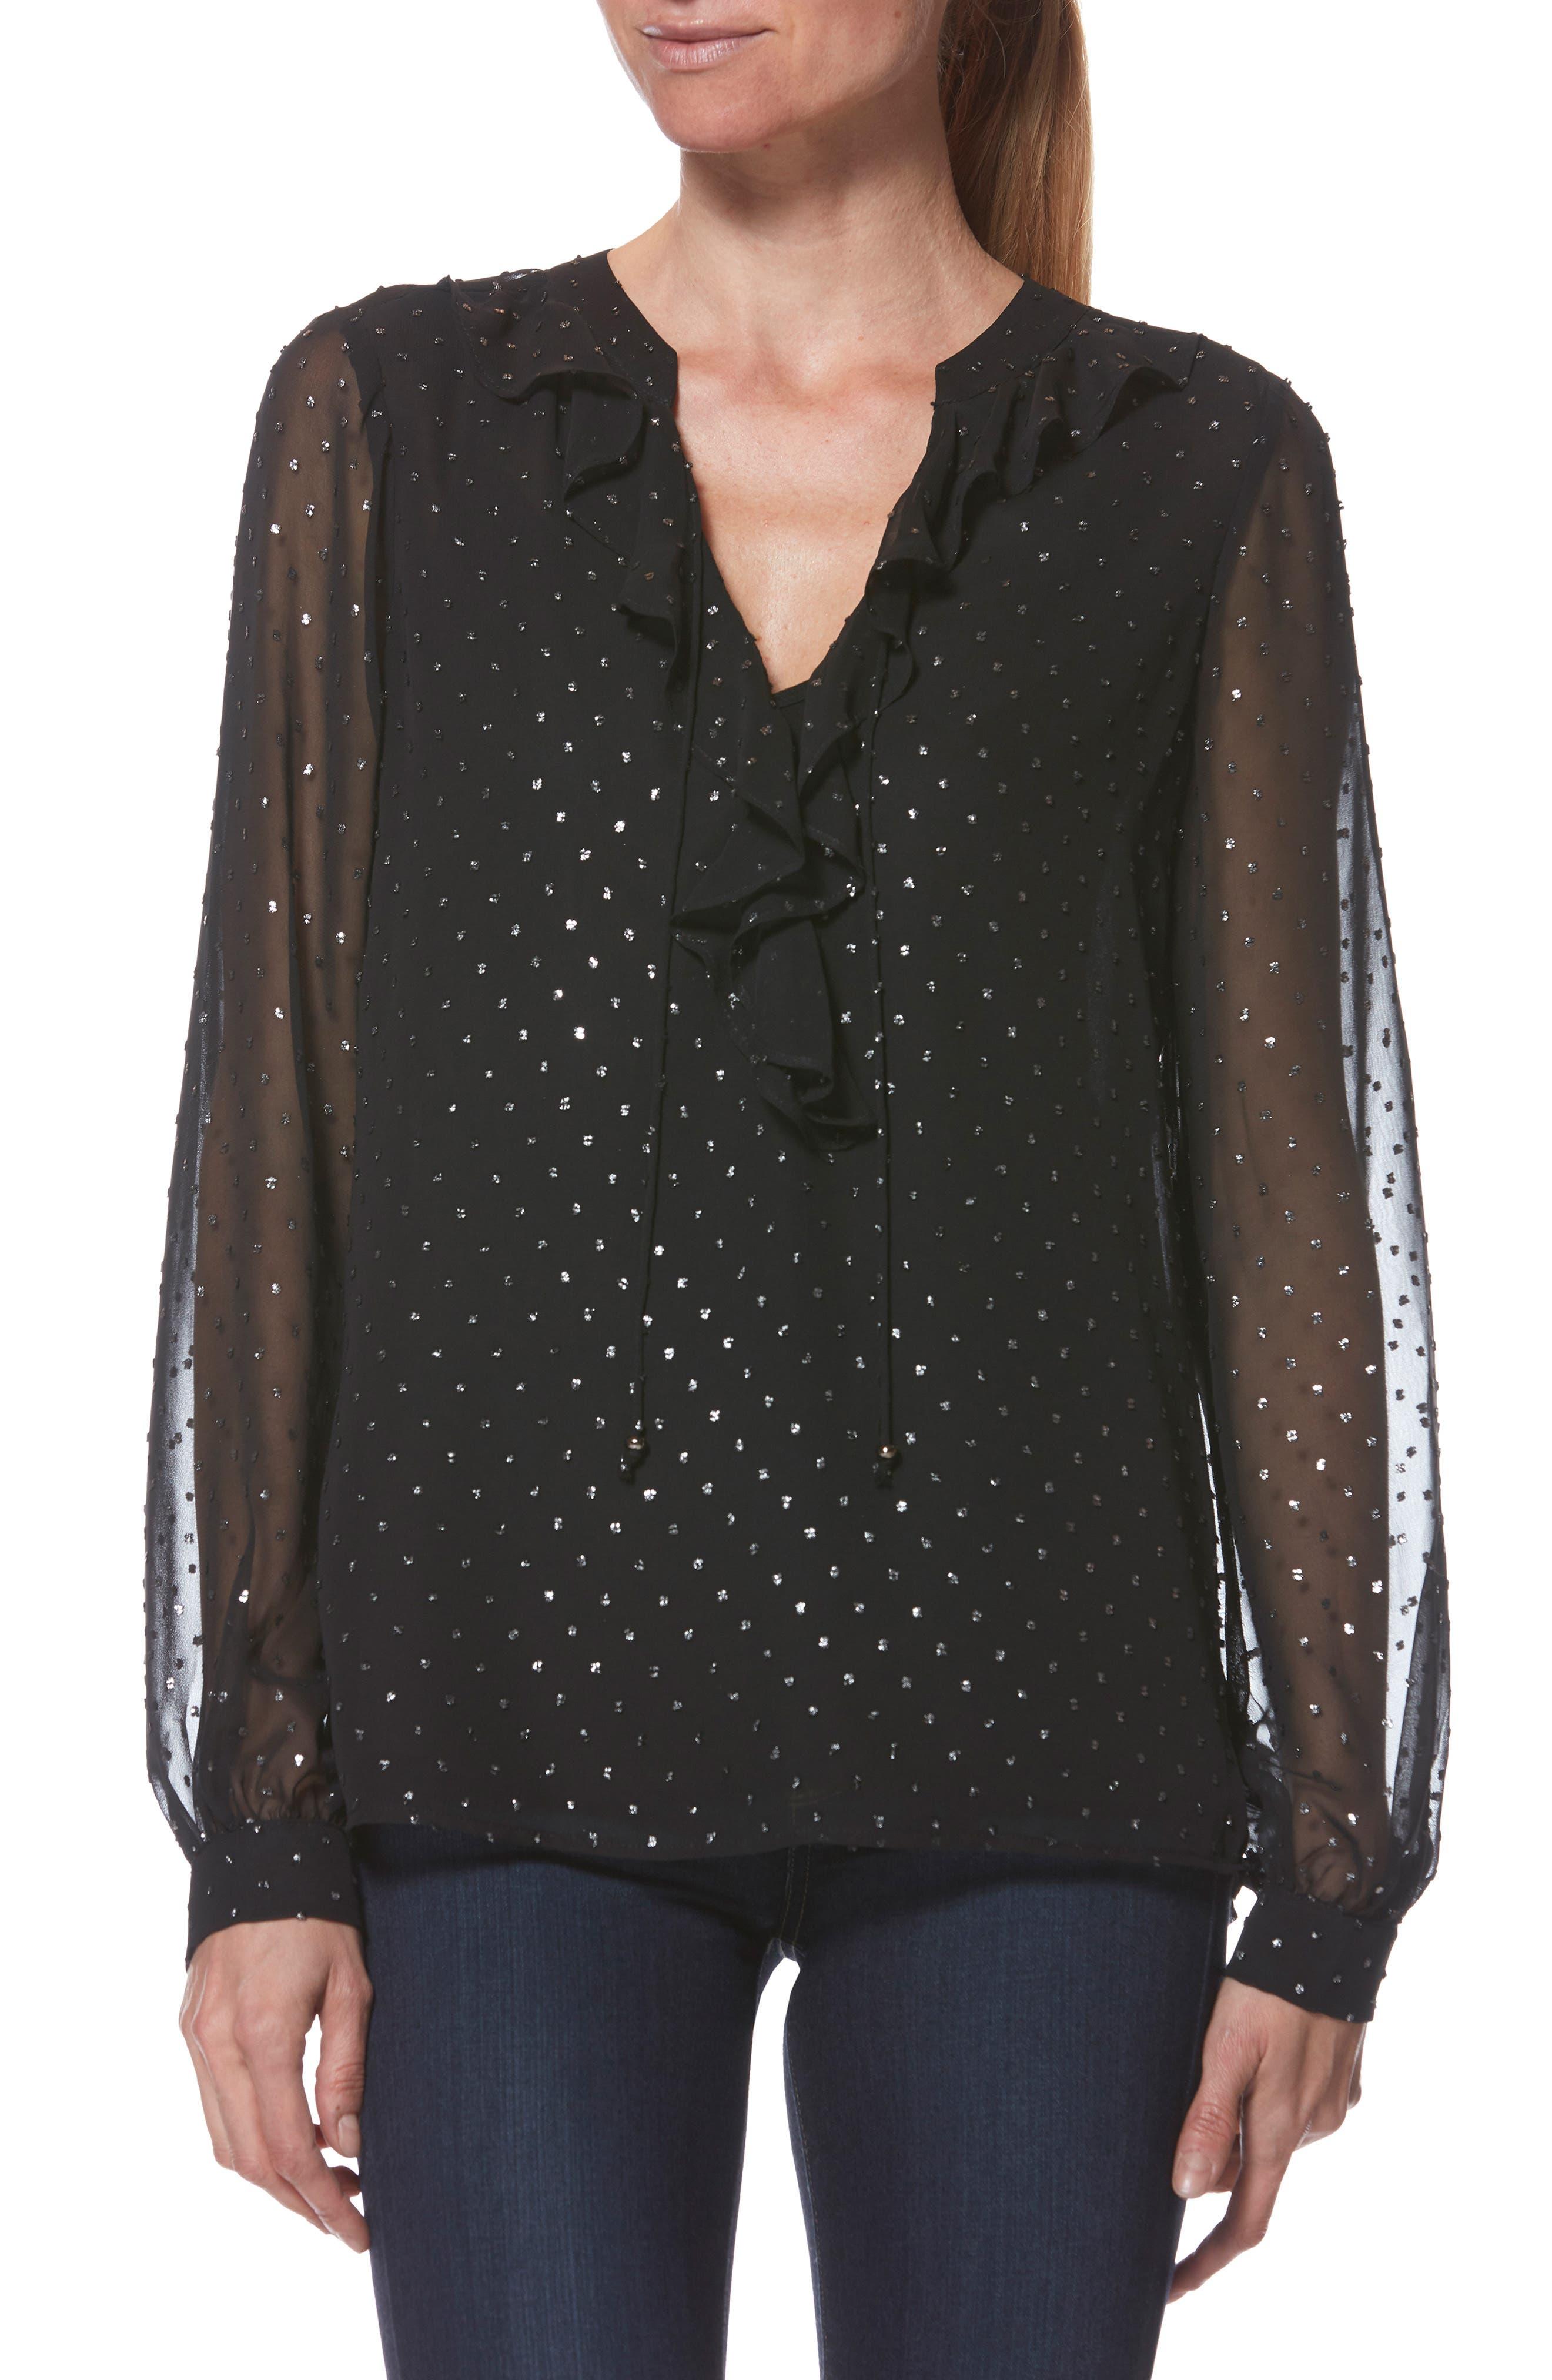 PAIGE Marella Shimmer Dot Blouse, Main, color, BLACK